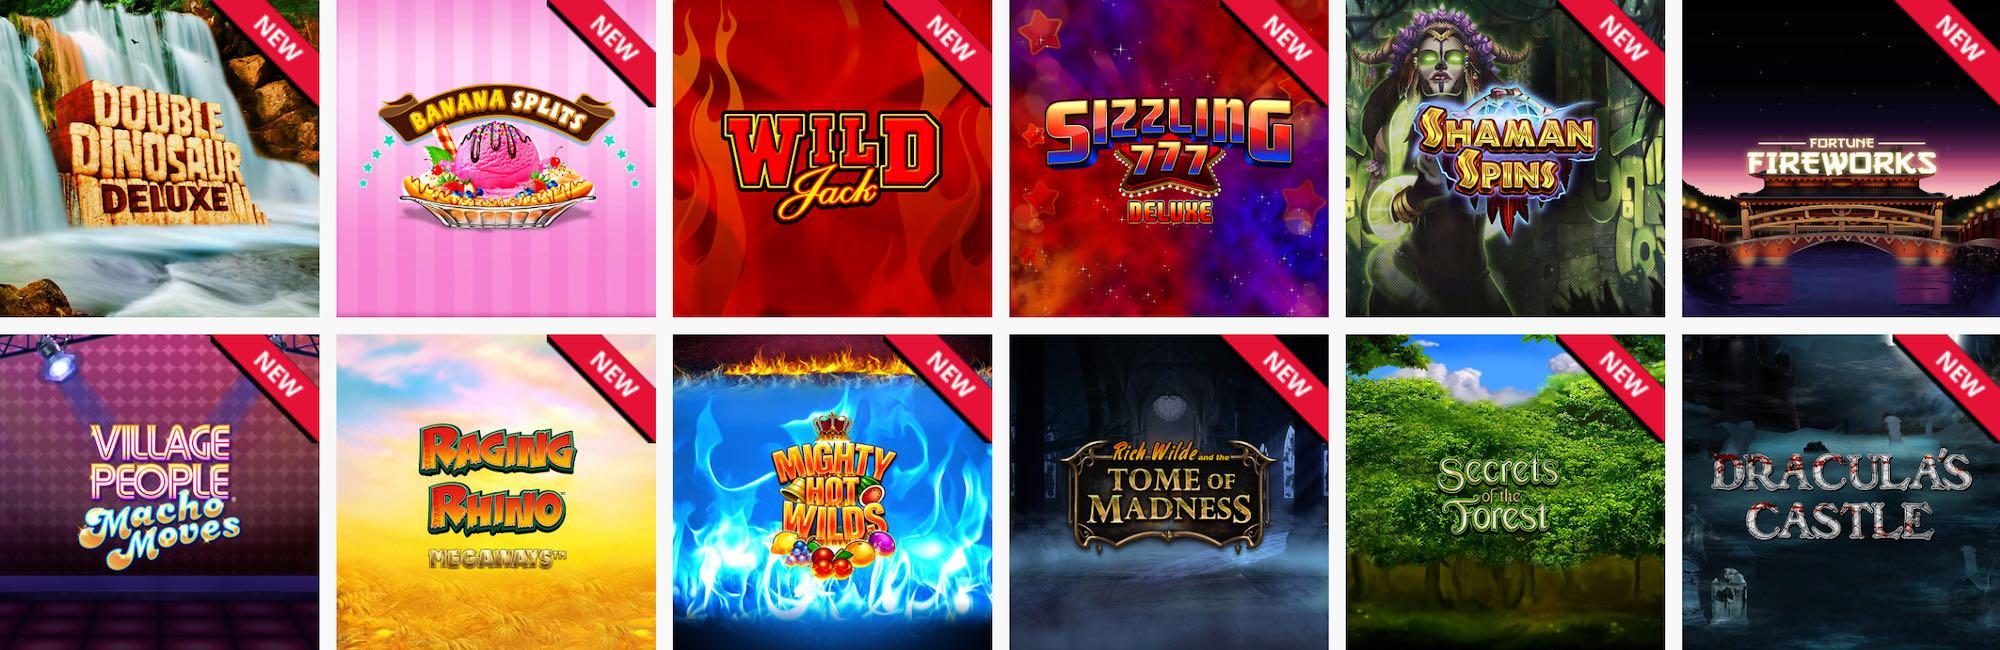 Dream Vegas Casino Spiele